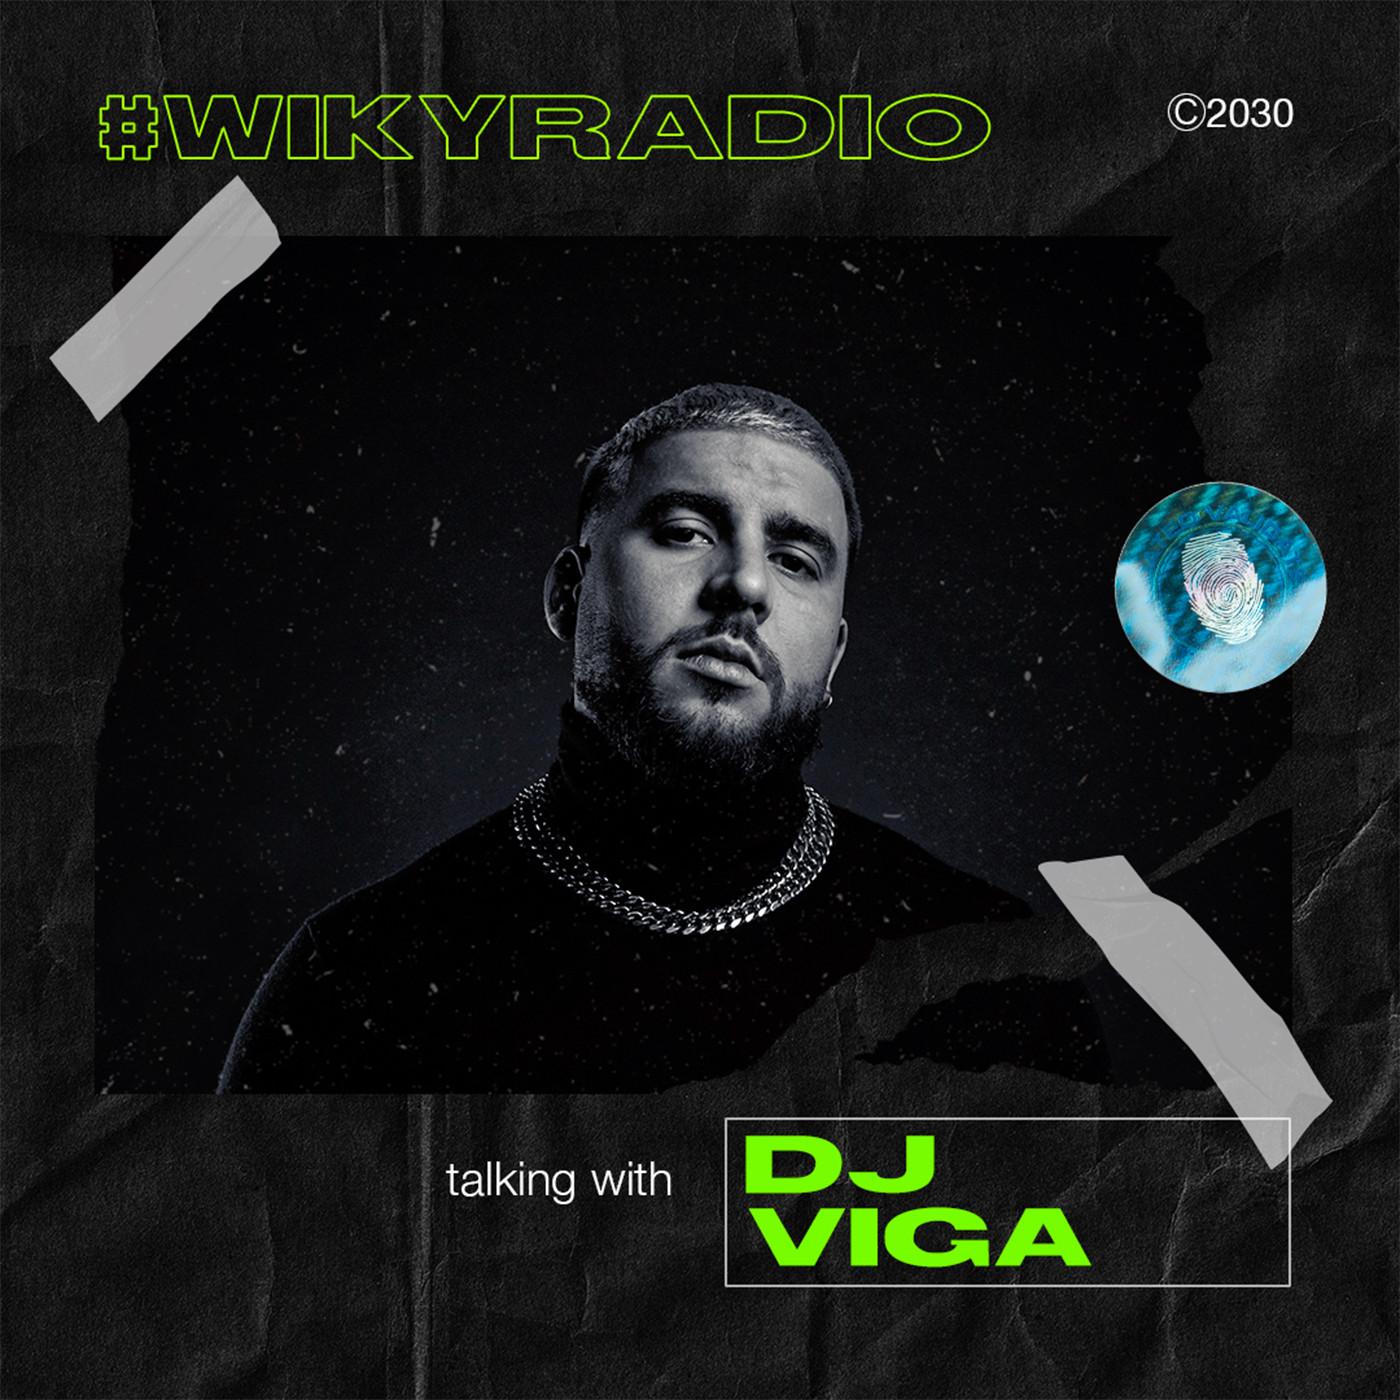 WIKY RADIO - TALKING WITH DJ VIGA